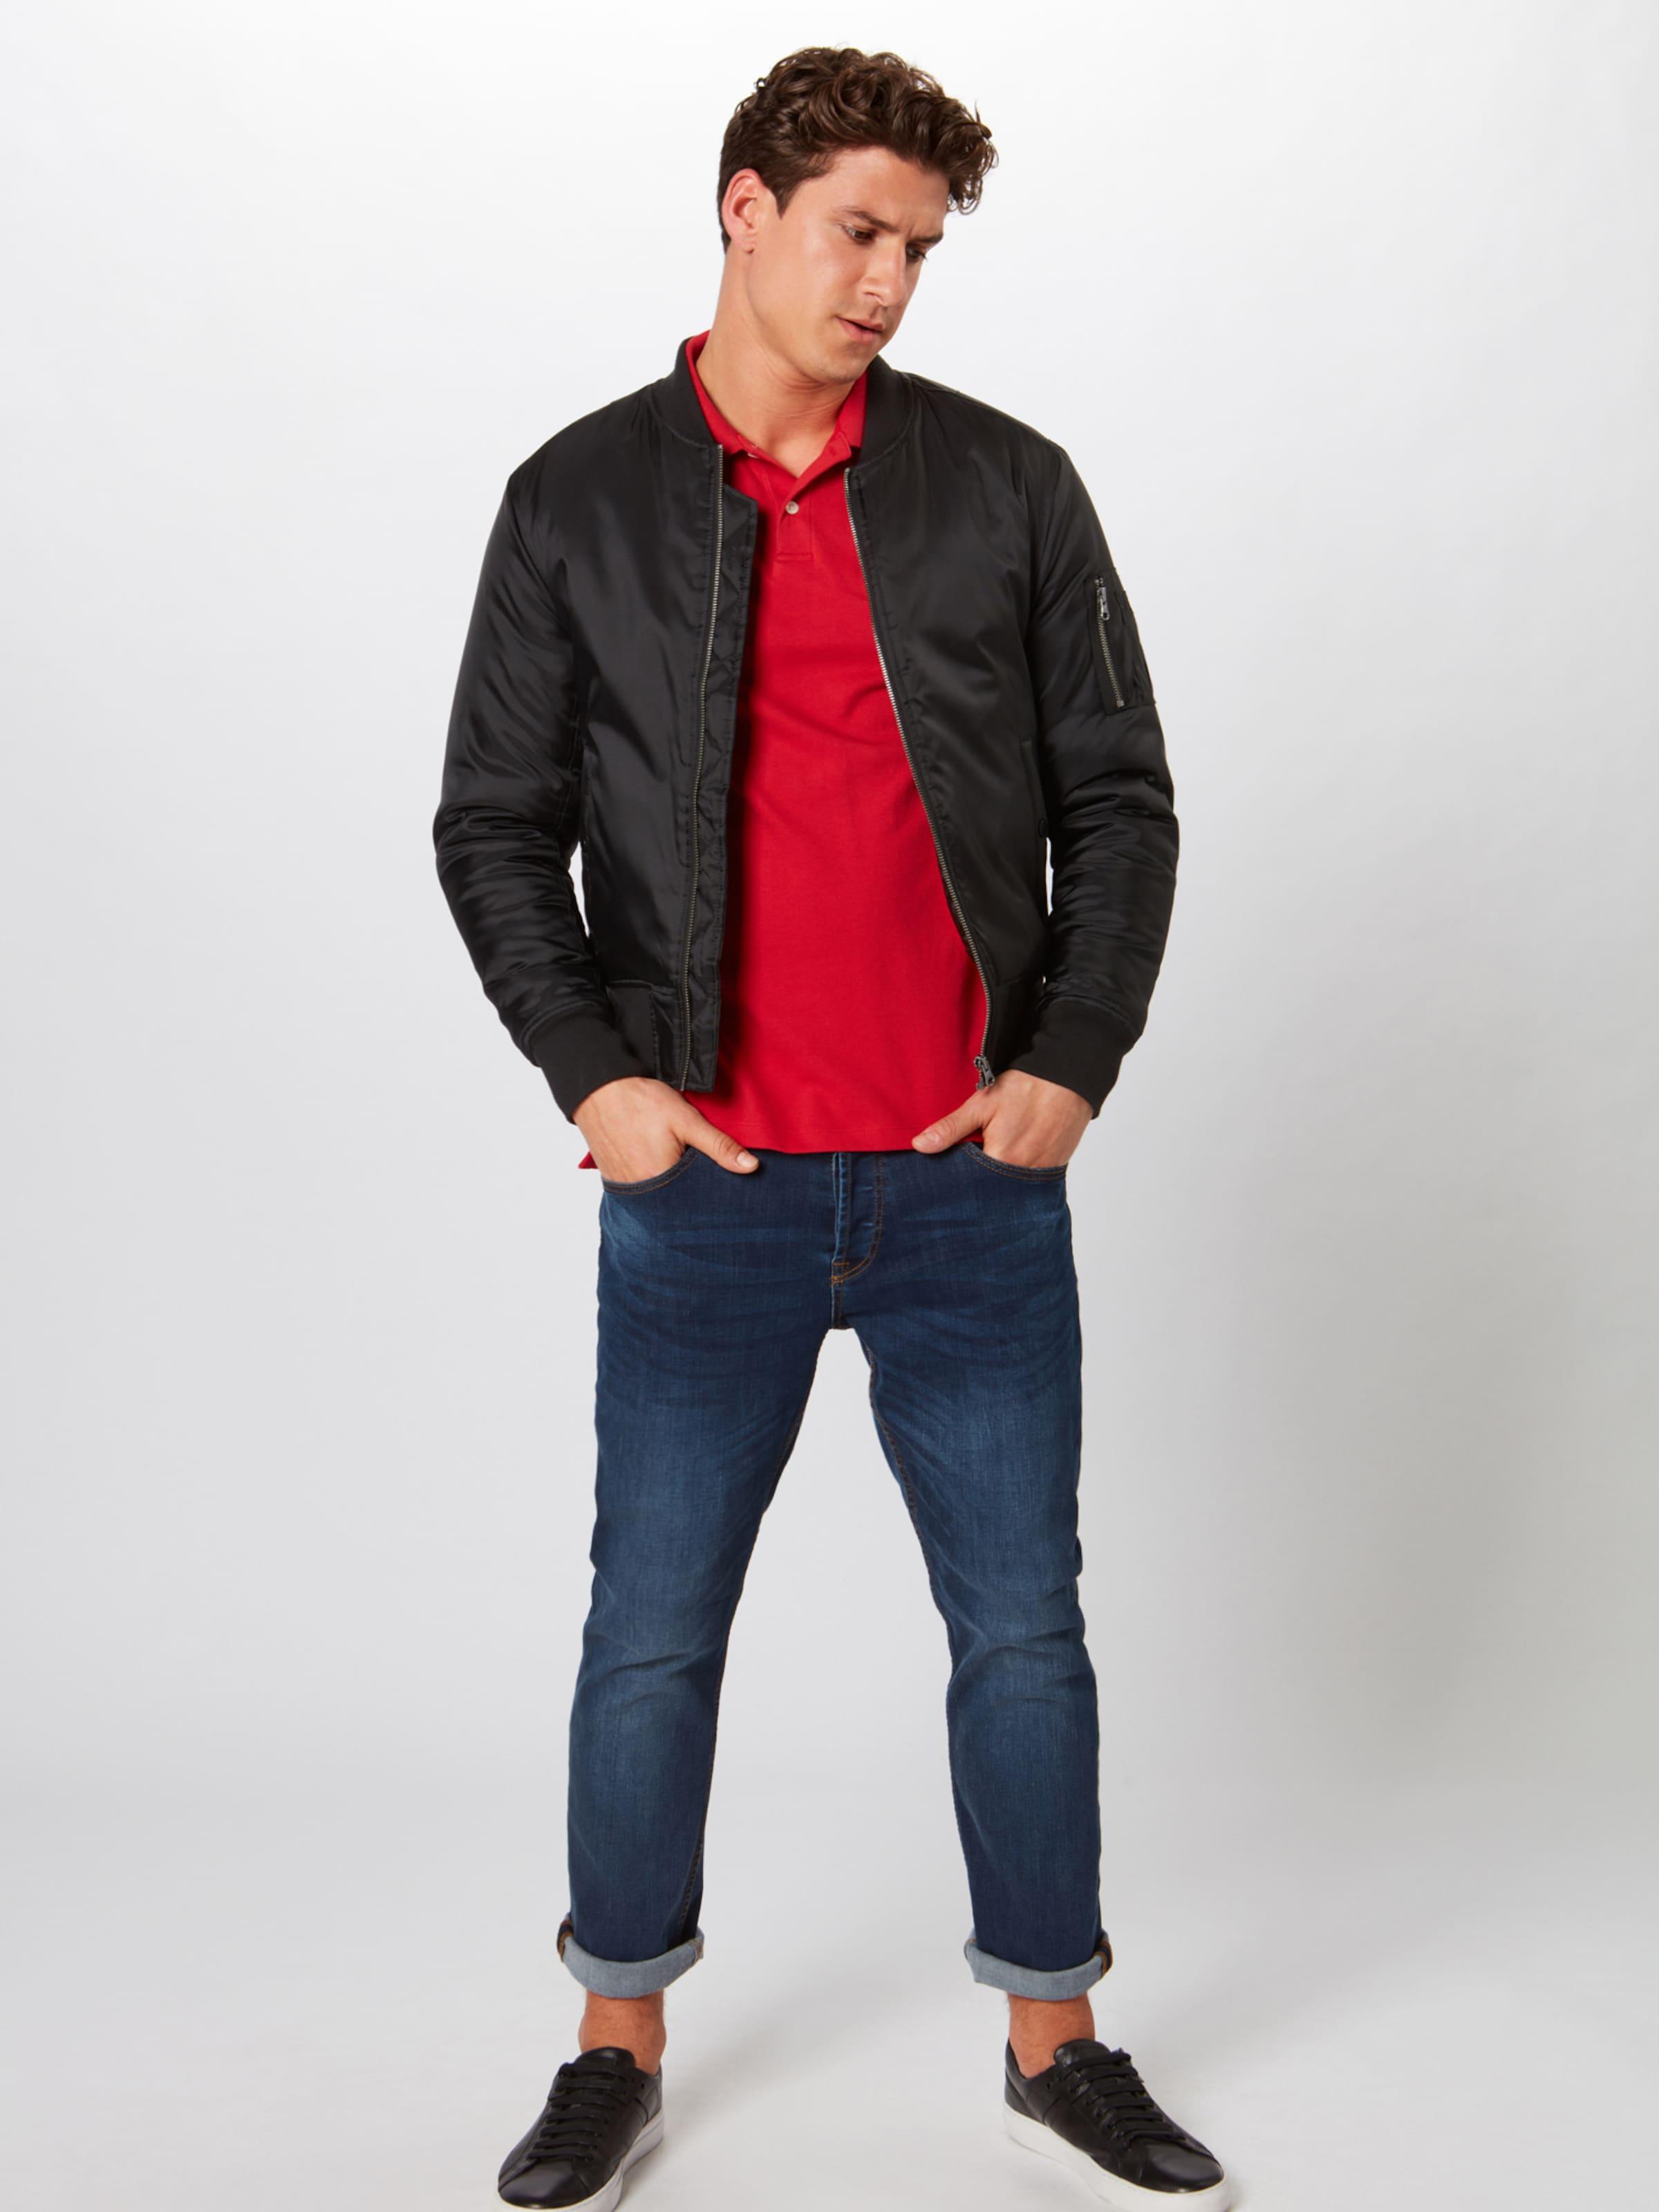 Gap Gap T shirt En En shirt T Rouge NmO8nv0w